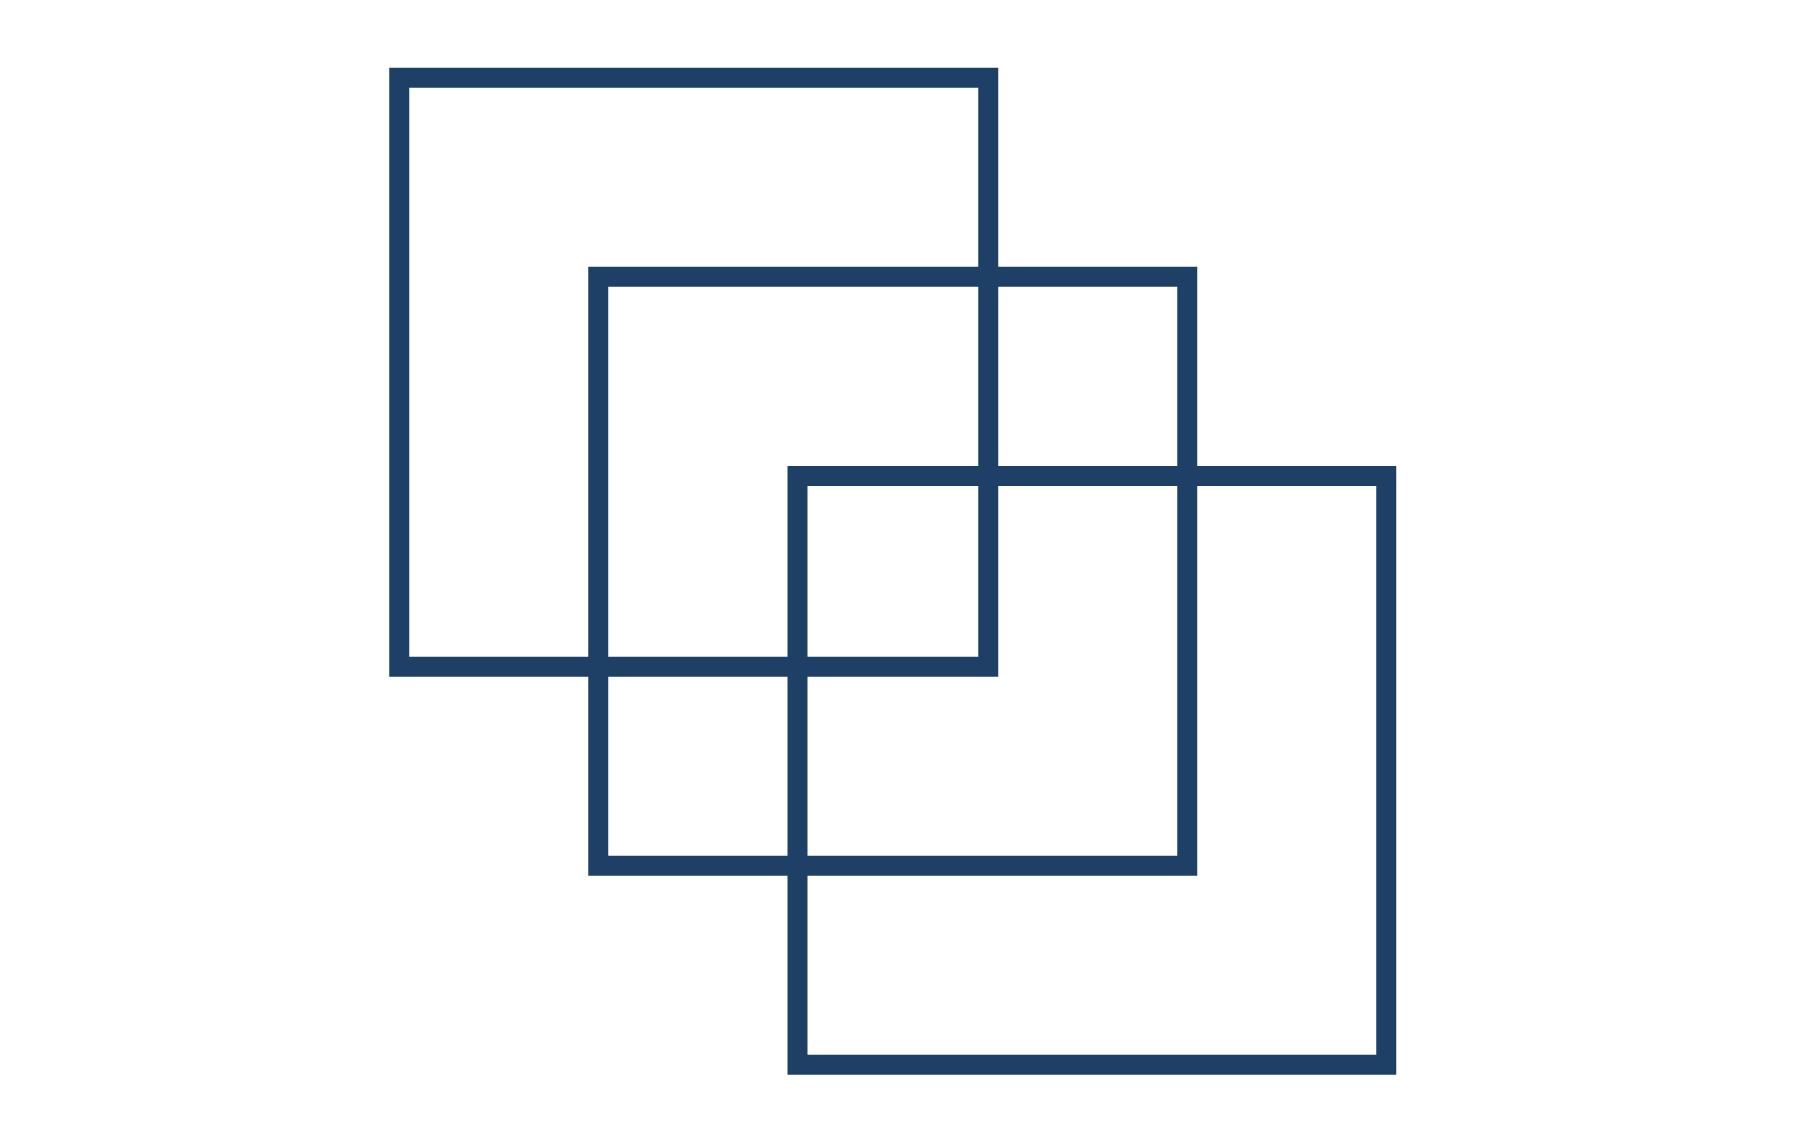 три пересекающихся квадрата — условия головоломки Льюиса Кэрролла